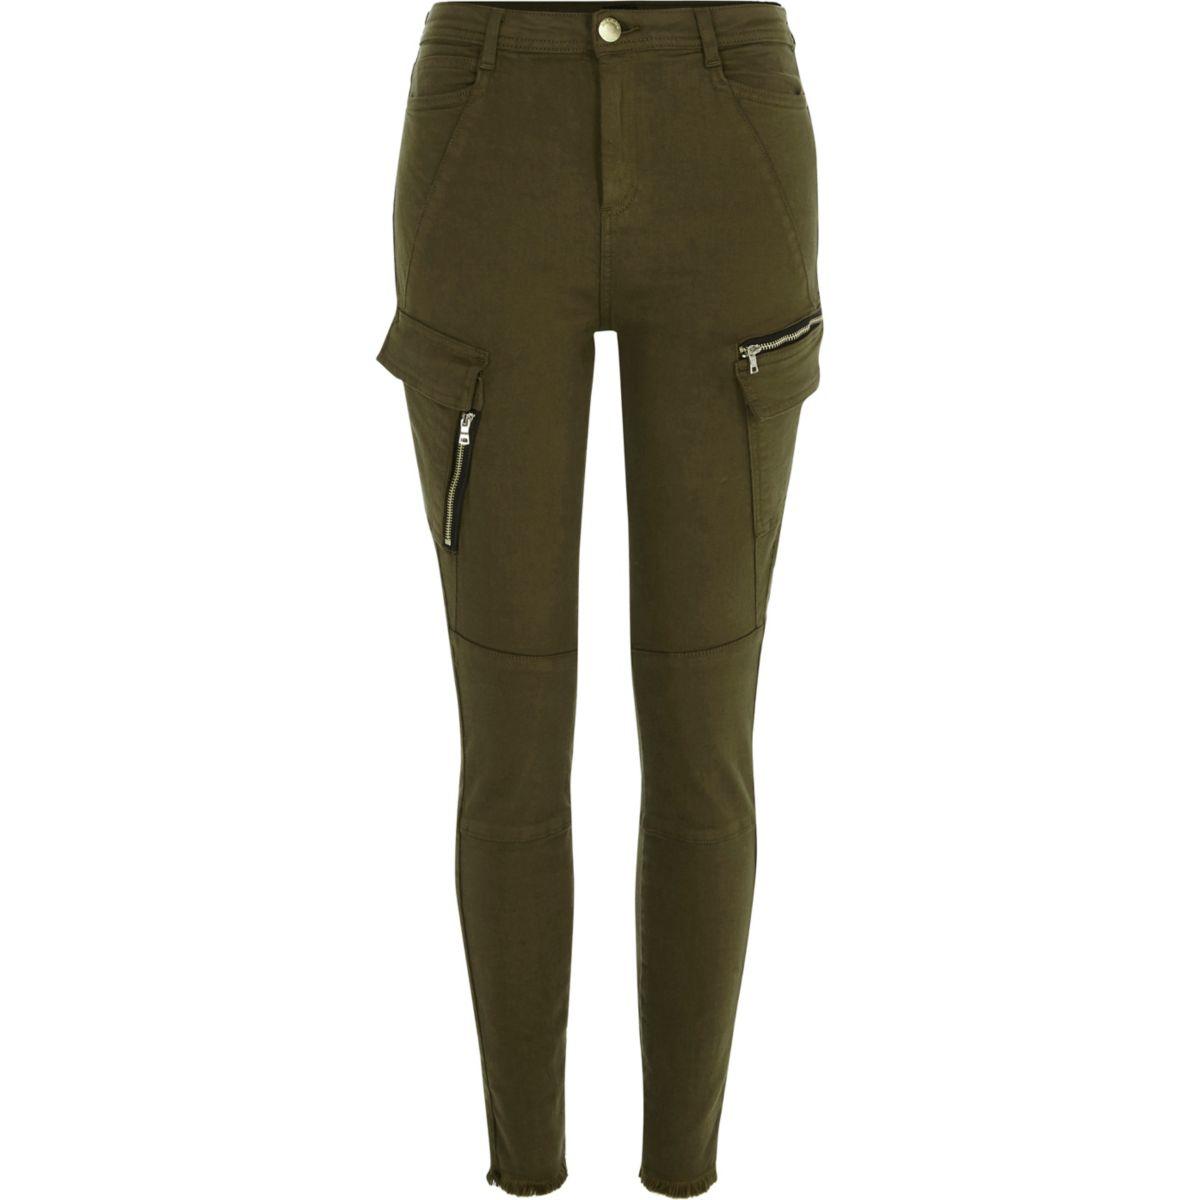 Khaki green skinny combat pants